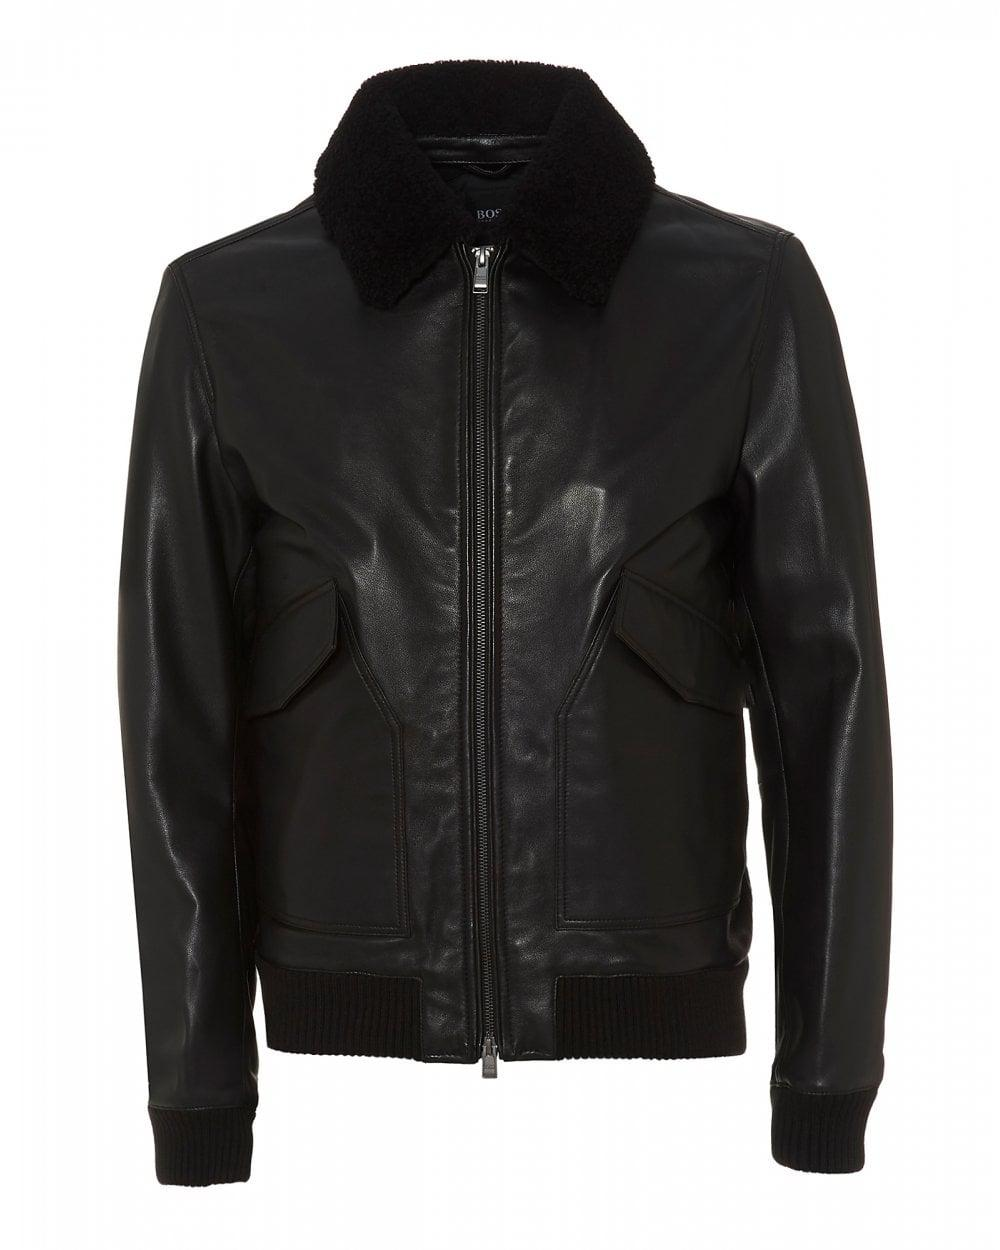 f01e1a67d4f Lyst - BOSS Gordani Black Leather Bomber Jacket in Black for Men